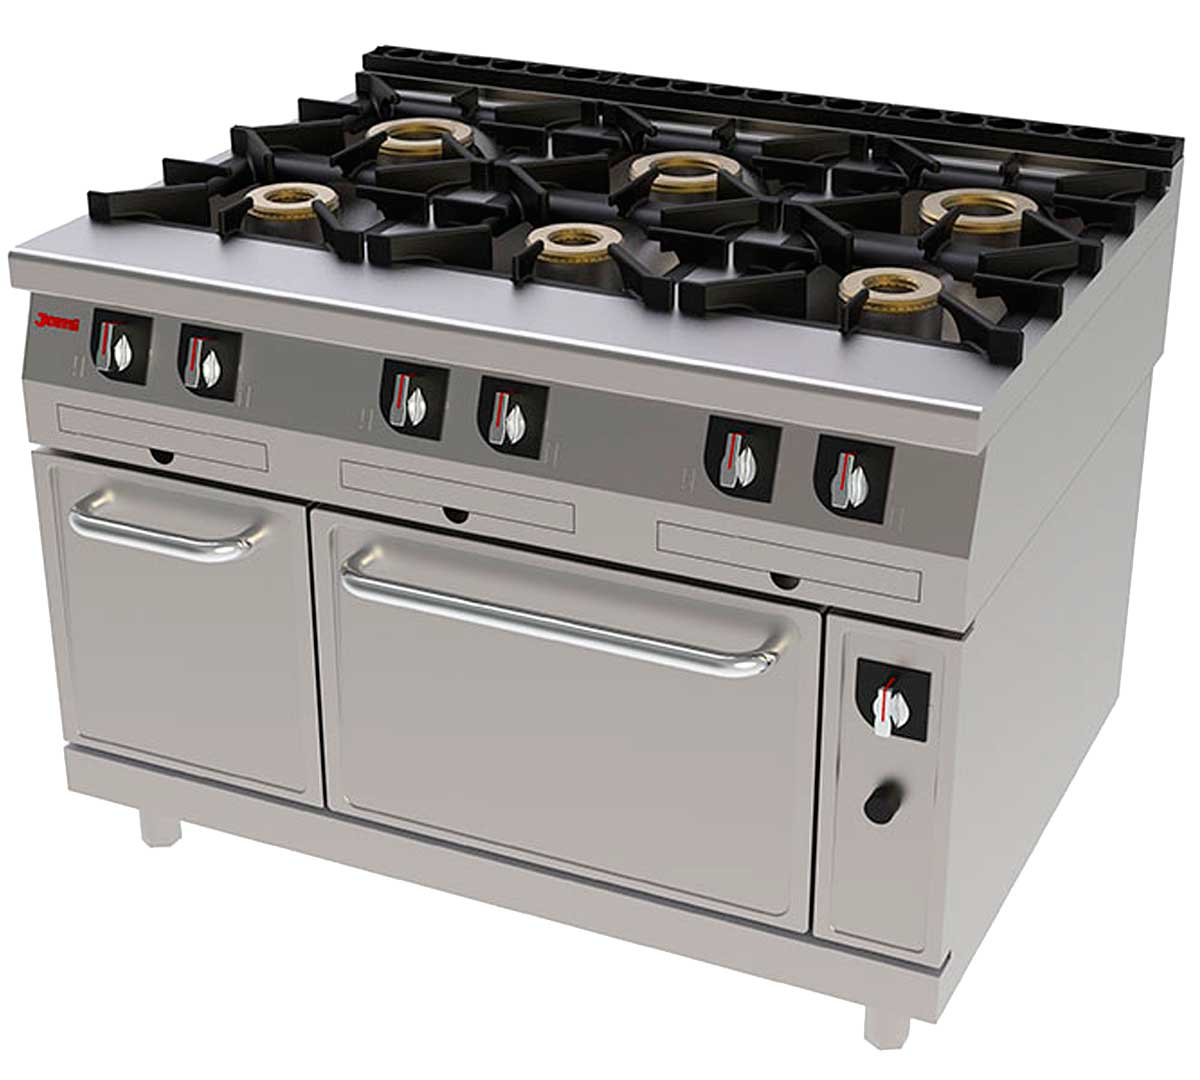 Cocina serie 900 gas horno de jemi for Fogones industriales a gas